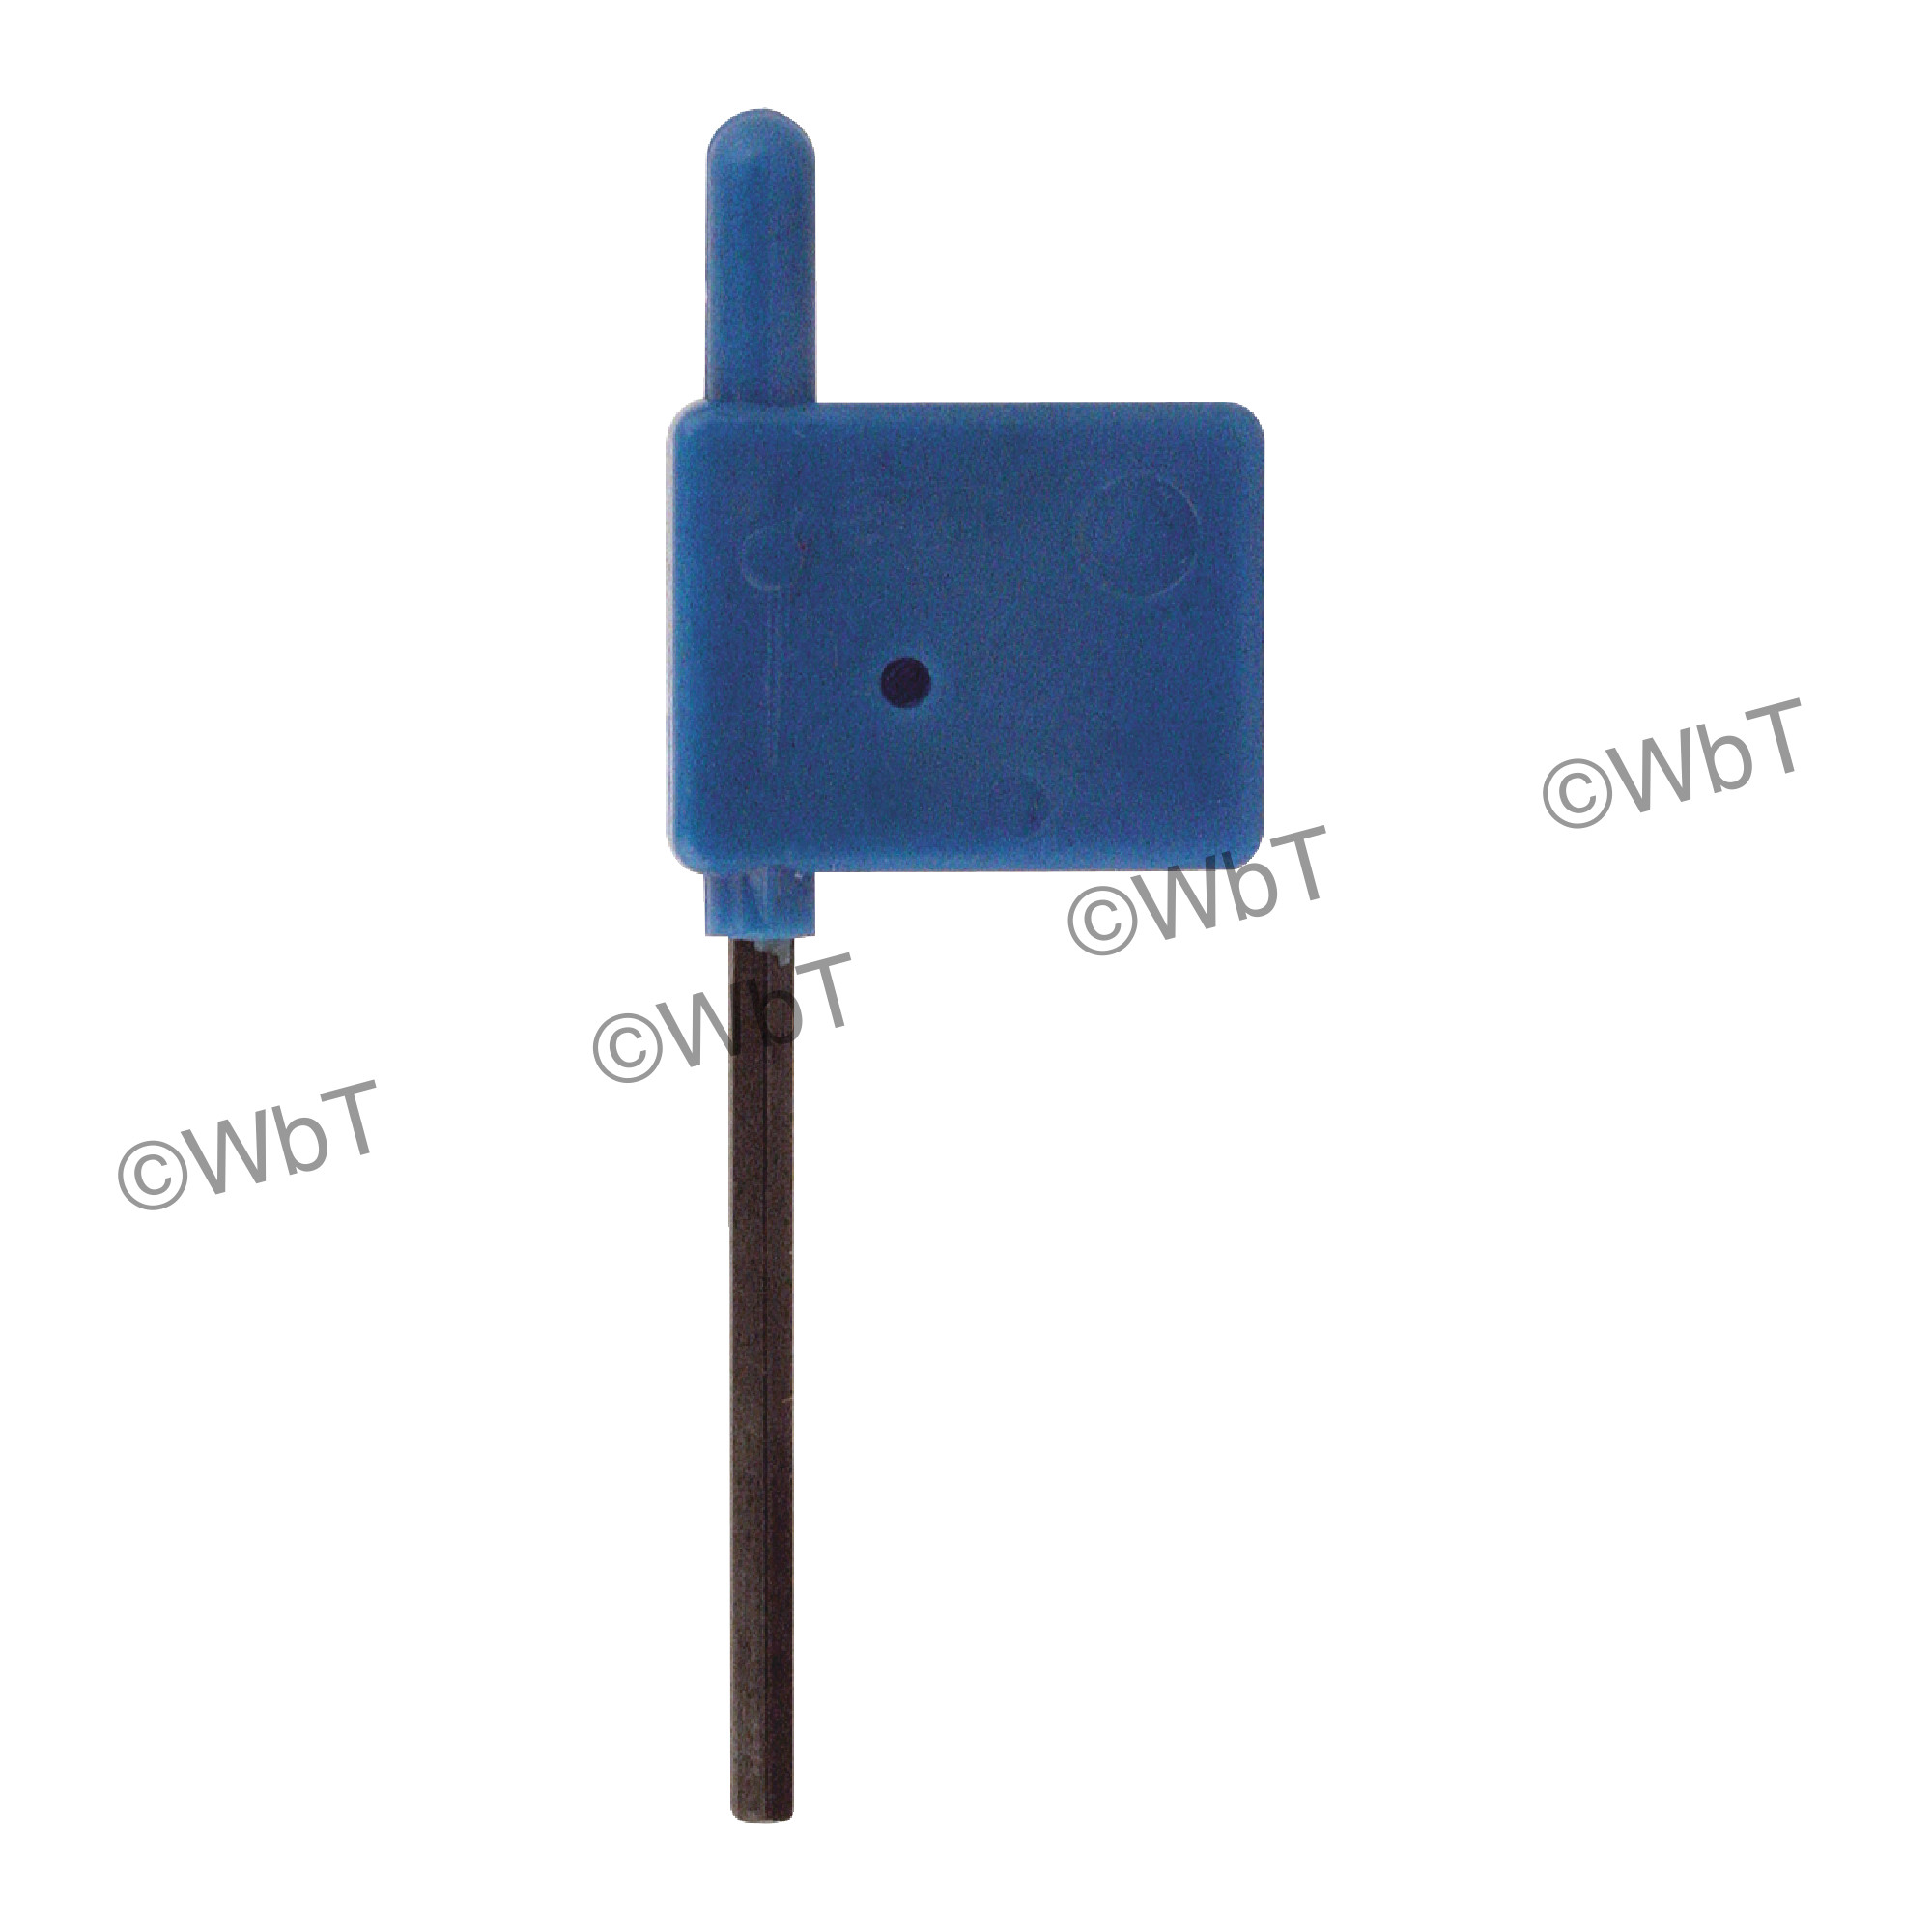 HW 3/5 Hex Key for MWLNR/L Toolholder